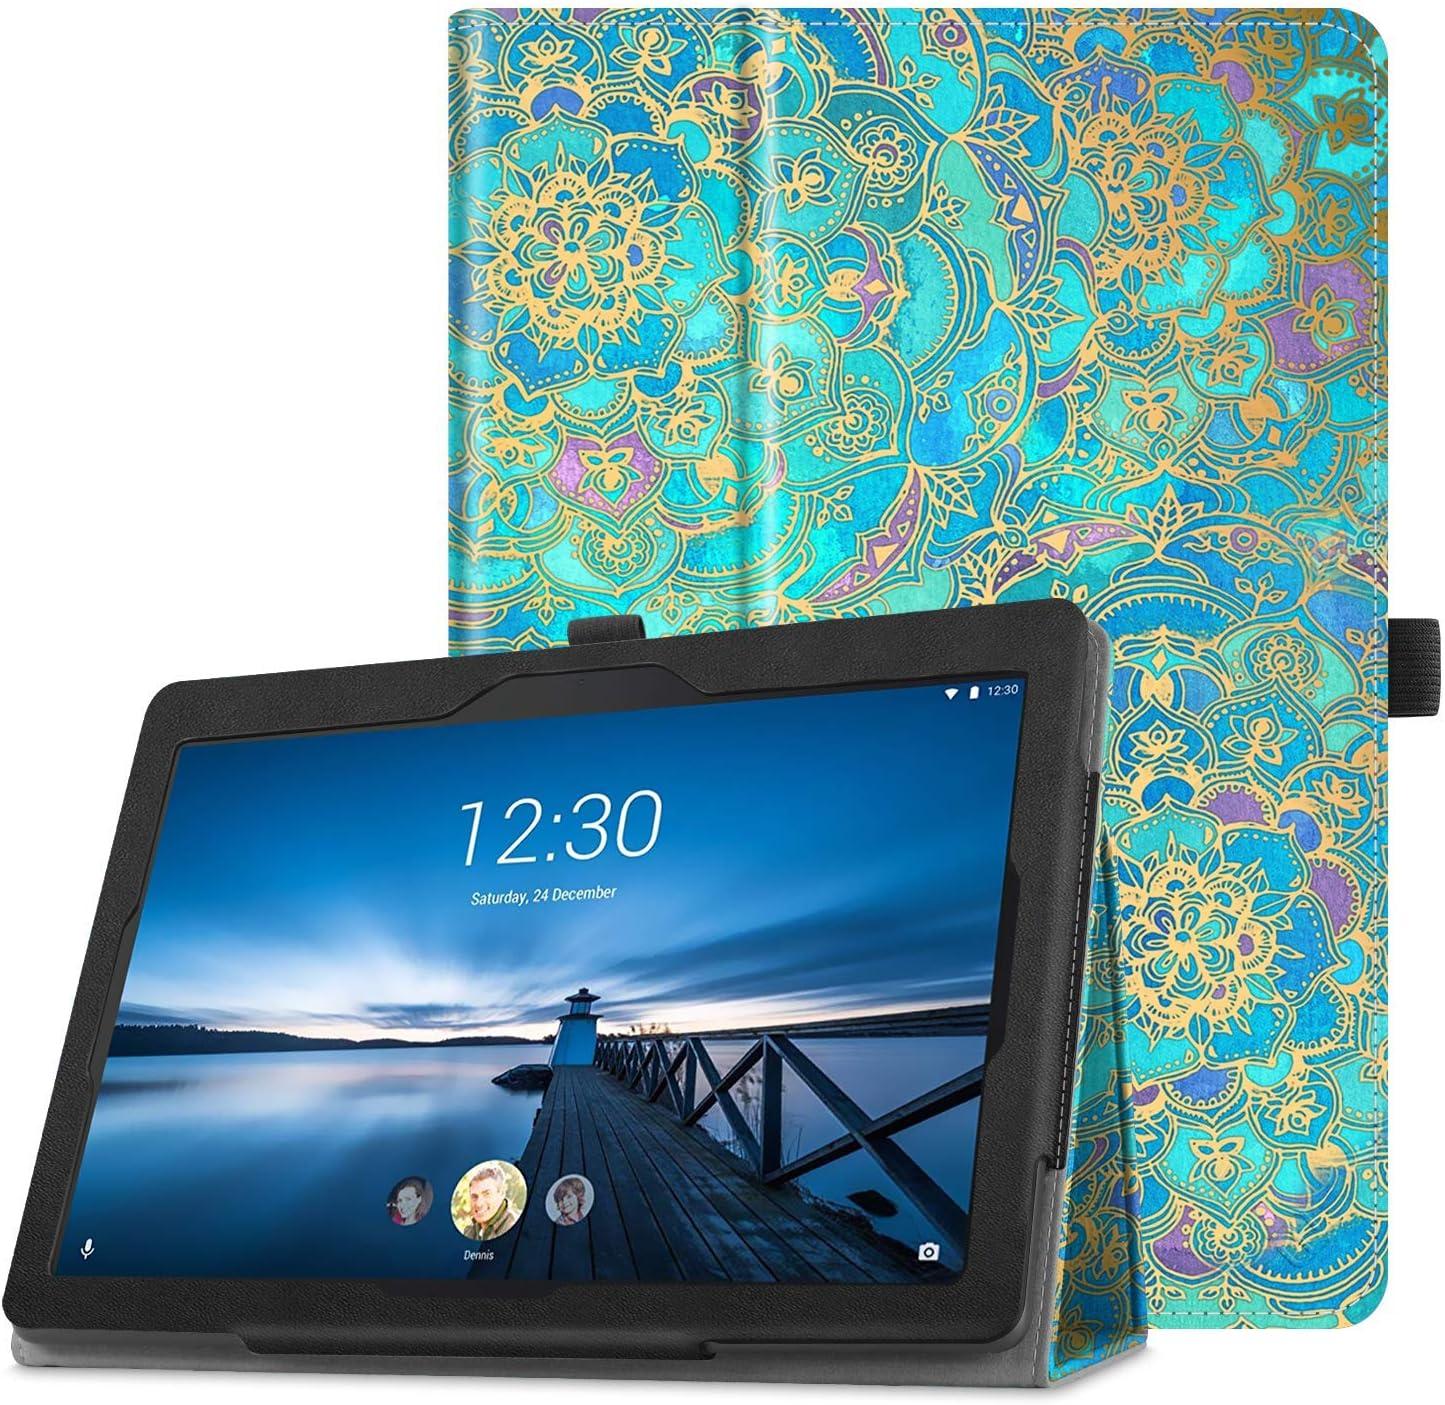 Fintie Case for Lenovo Tab 4 10 / Tab 4 Plus 10 / AT&T Lenovo Moto Tab/TAB E10 TB-X104F 10.1-Inch Tablet - Premium PU Leather Folio Stand Cover with Auto Sleep/Wake, Shades of Blue